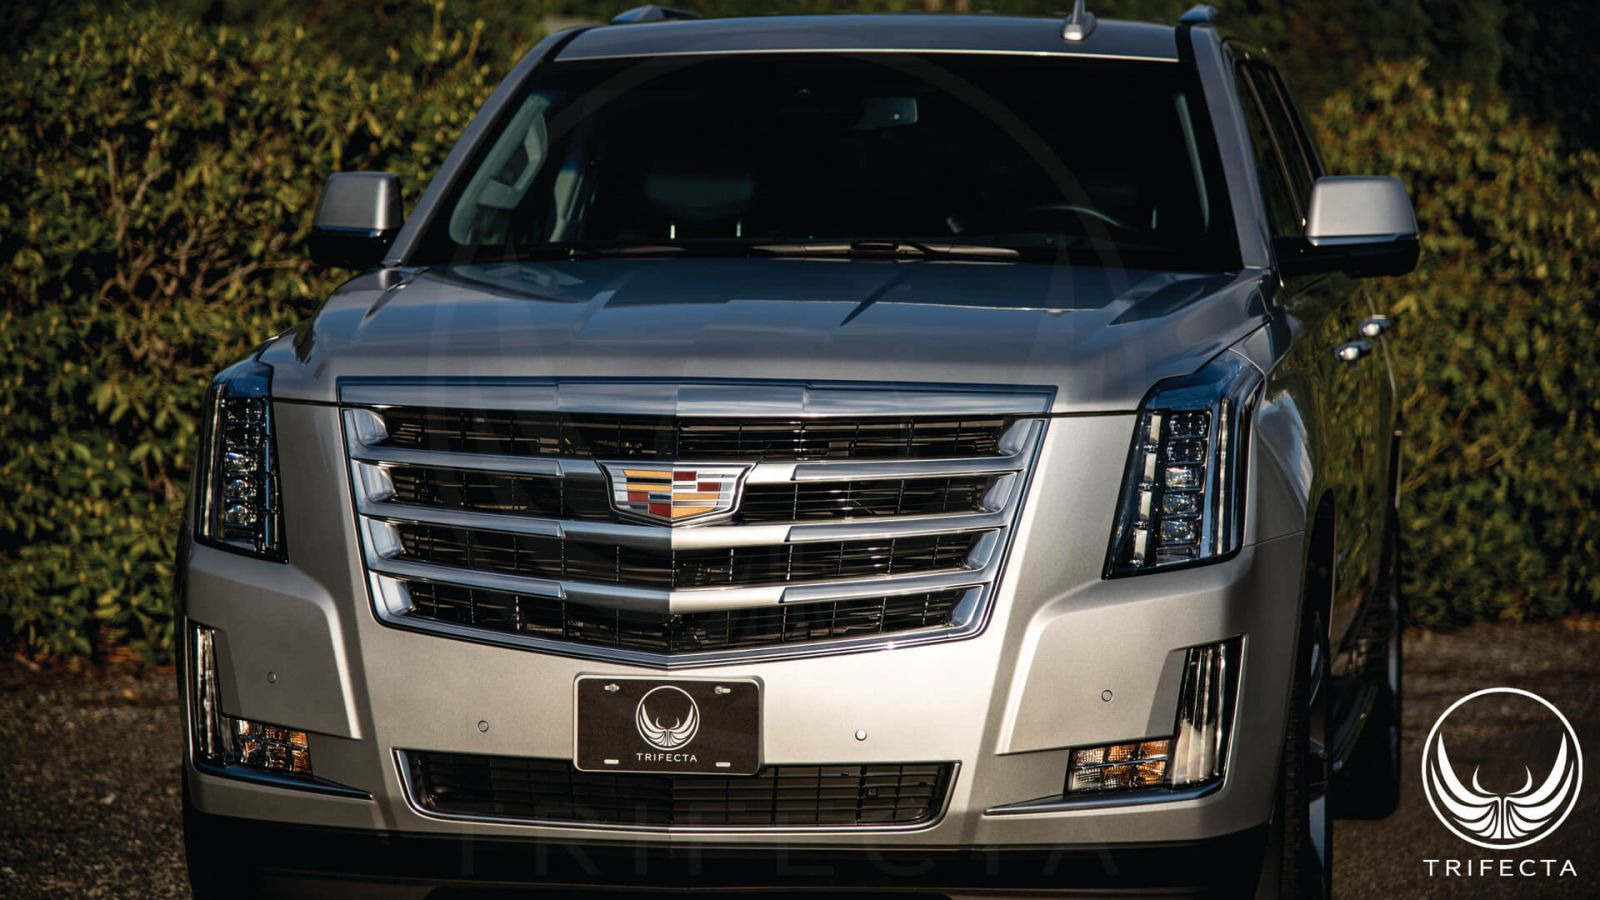 Trifecta Presents 2015 Chevrolet Tahoe Suburban Gmc